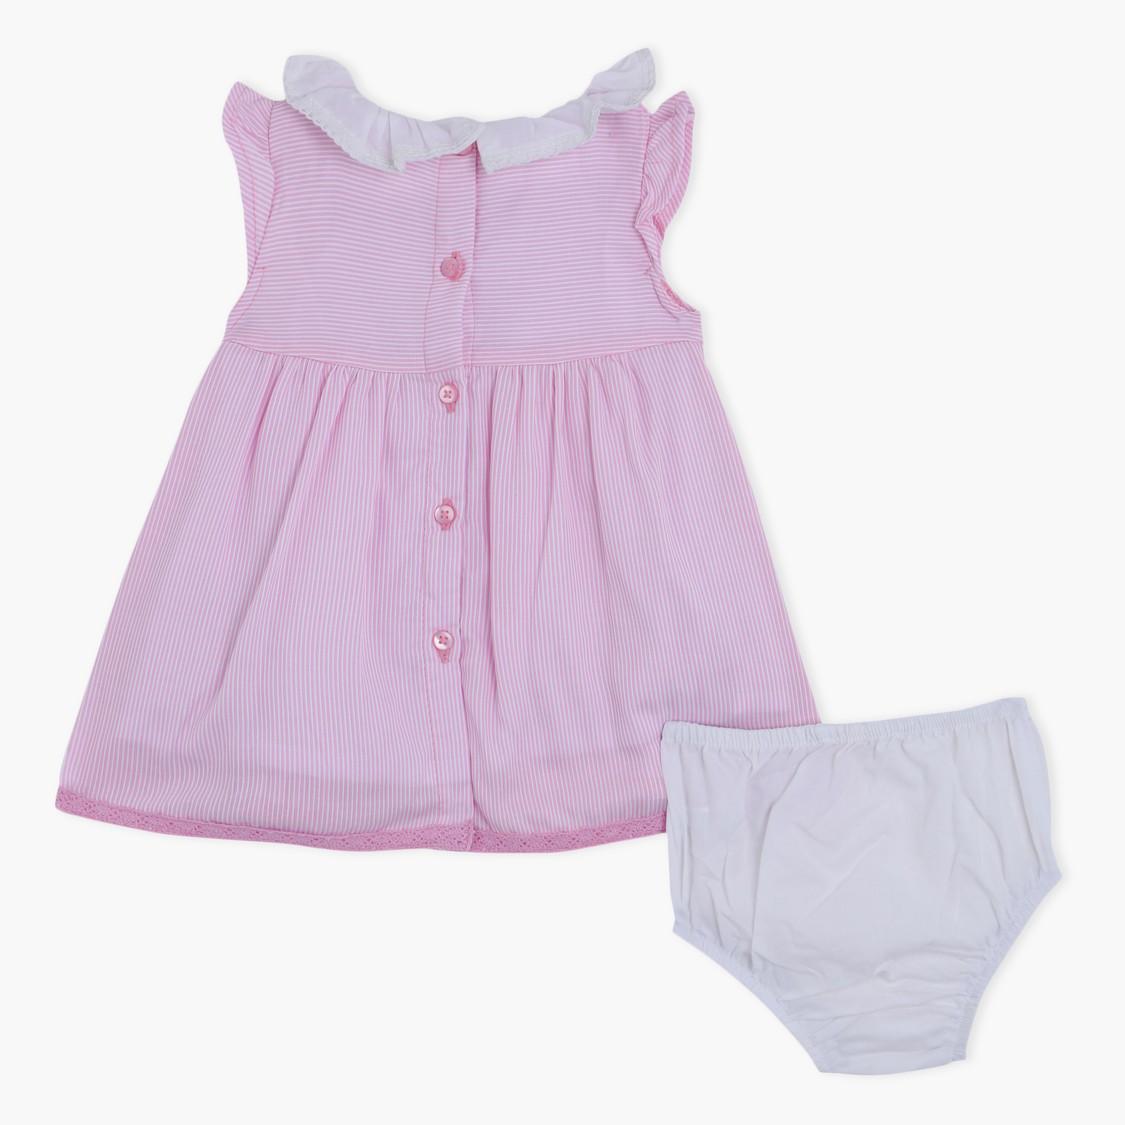 Printed Dress and Bloomer Set